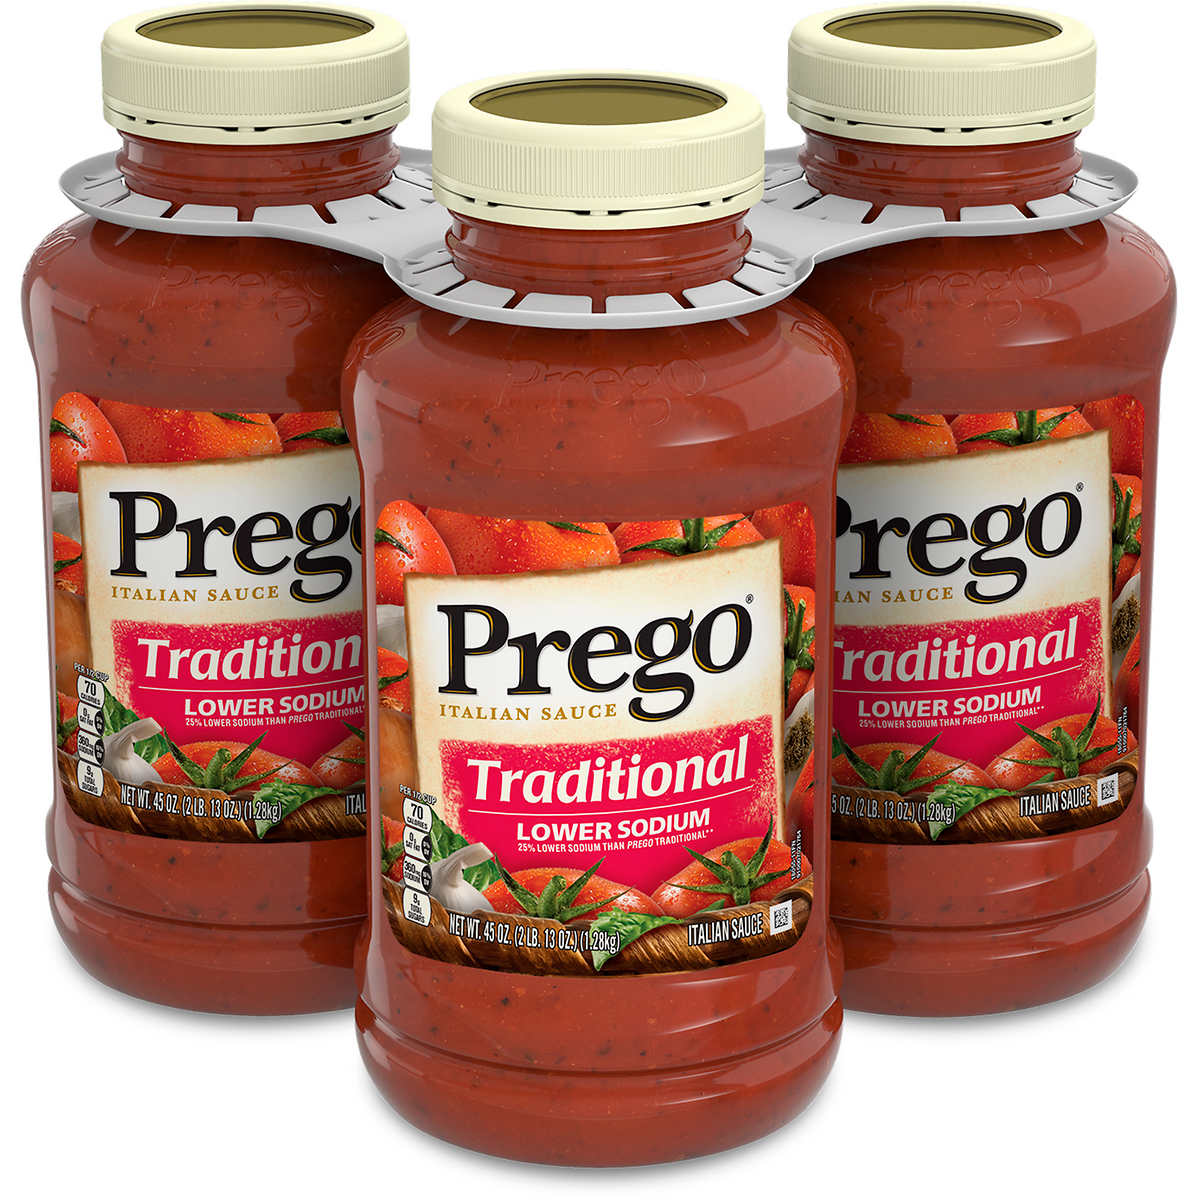 Lower Sodium Traditional Italian Sauce